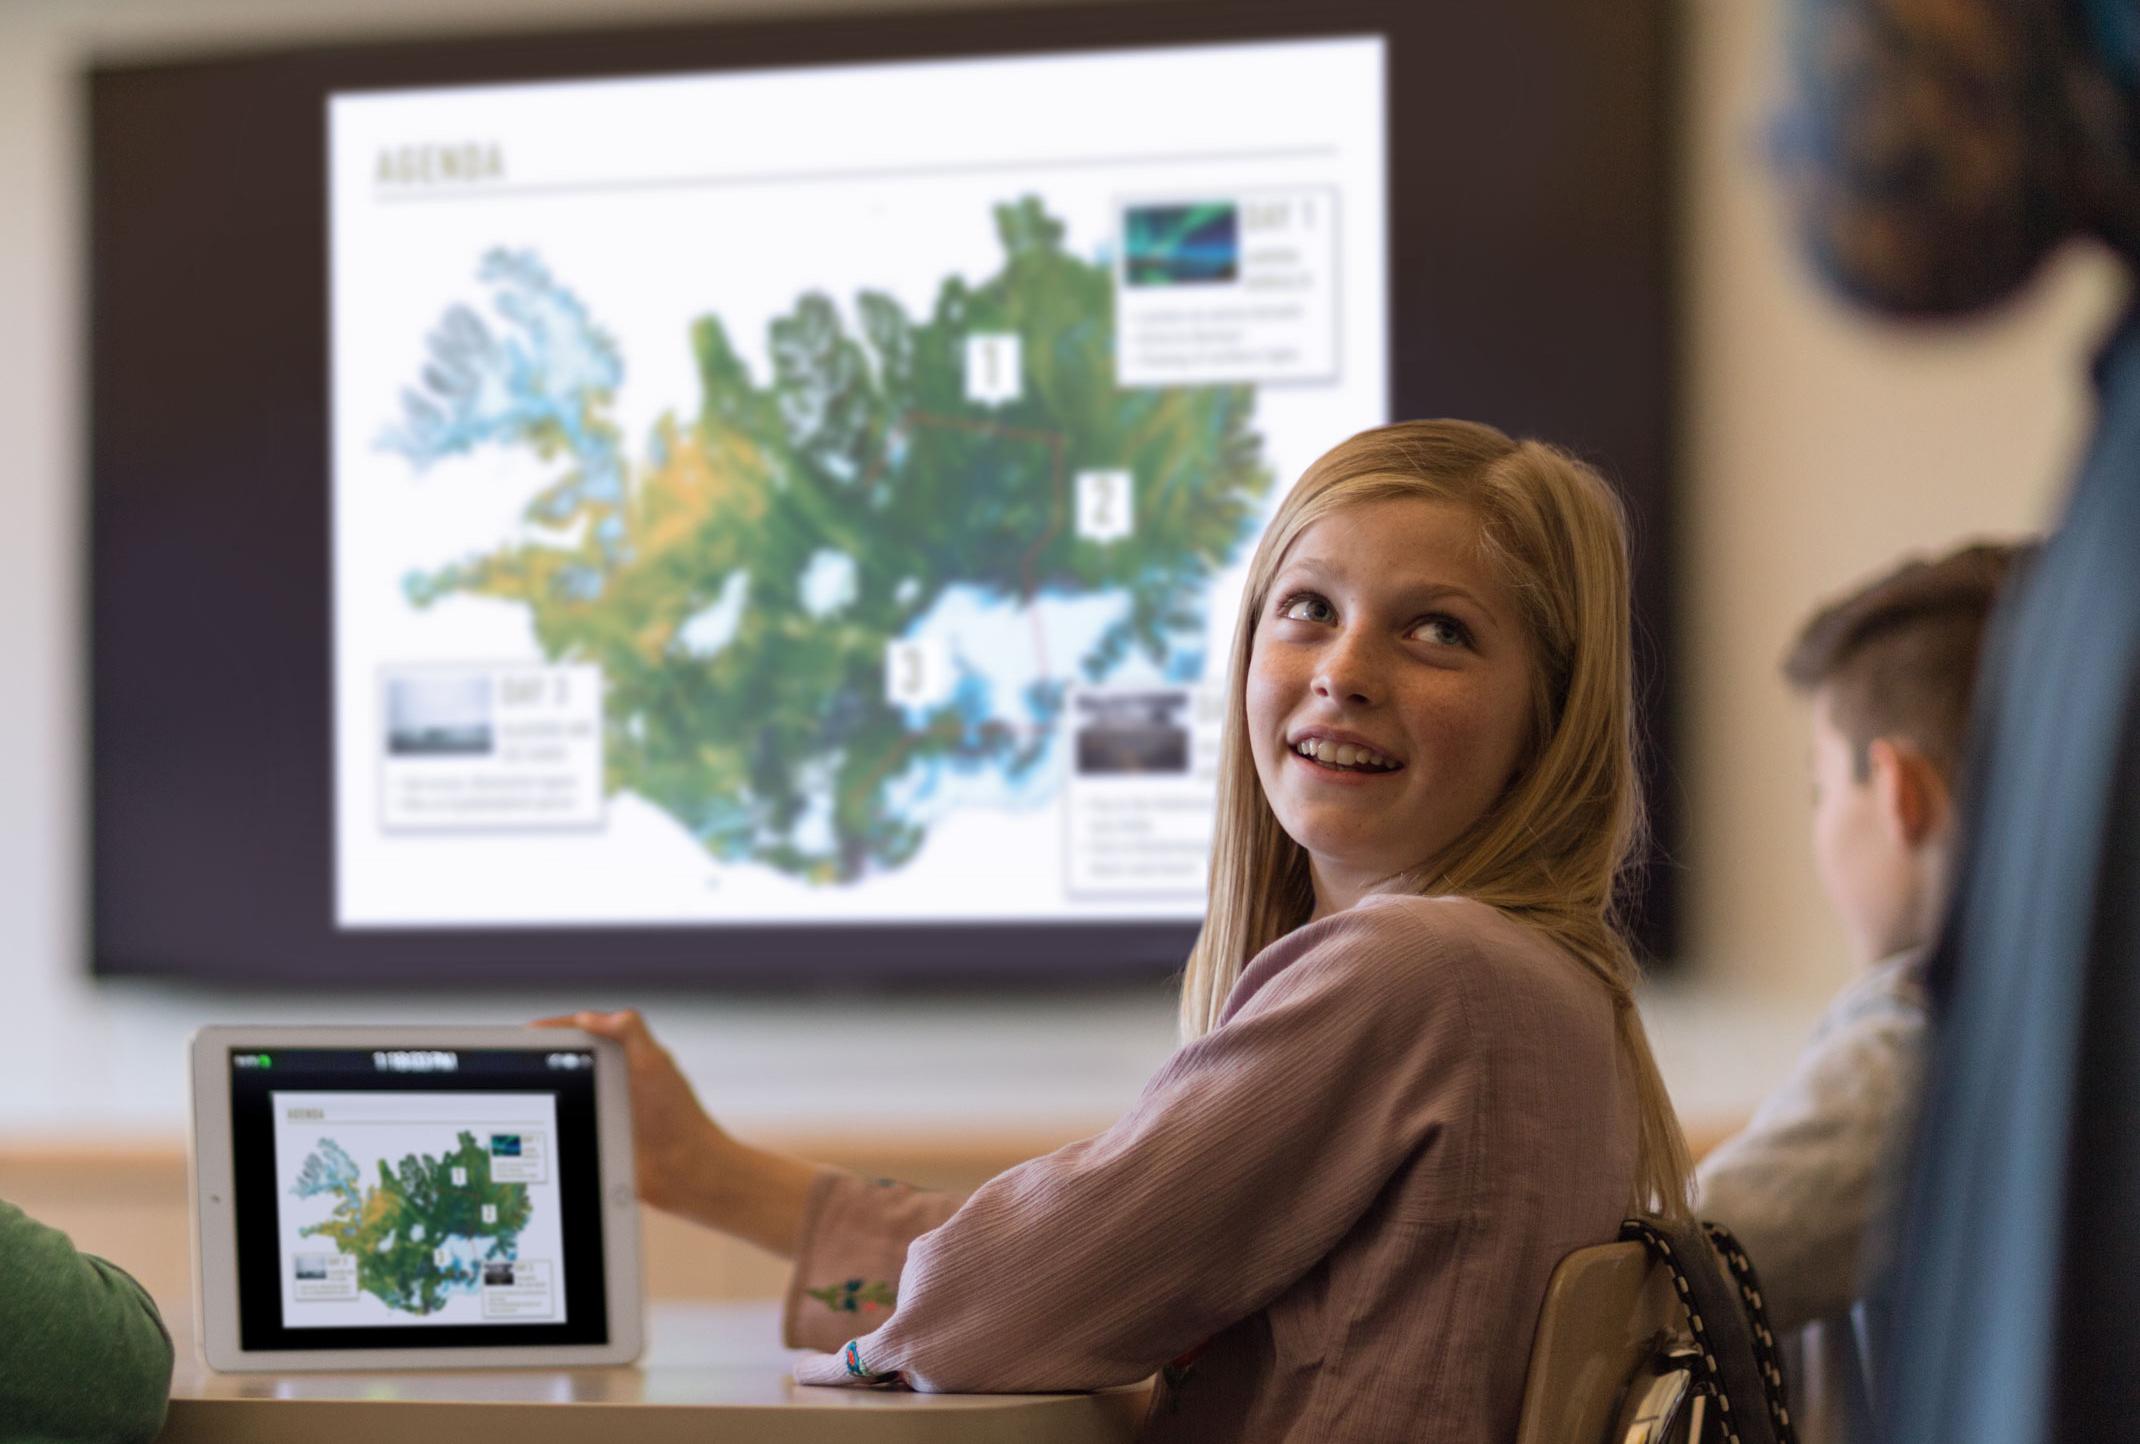 Apple WWDC 장학금 세부 사항 발표